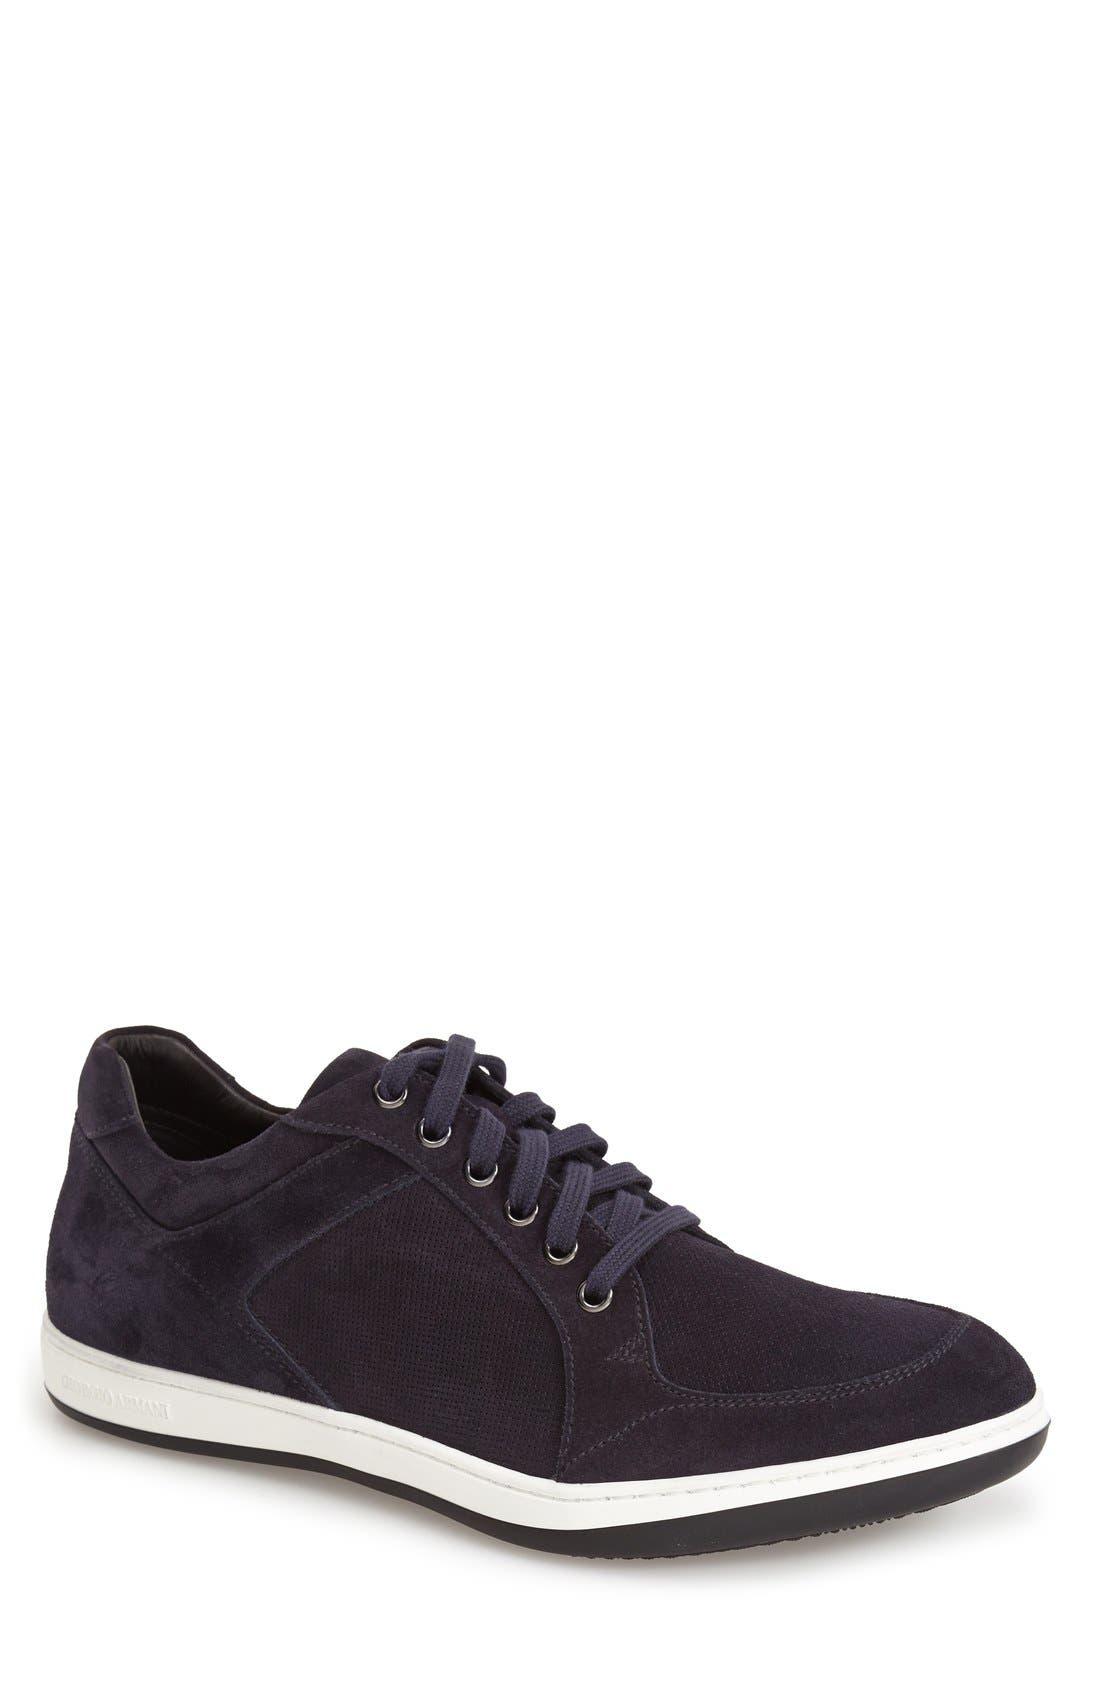 Giorgio Armani Perforated Suede Sneaker (Men)